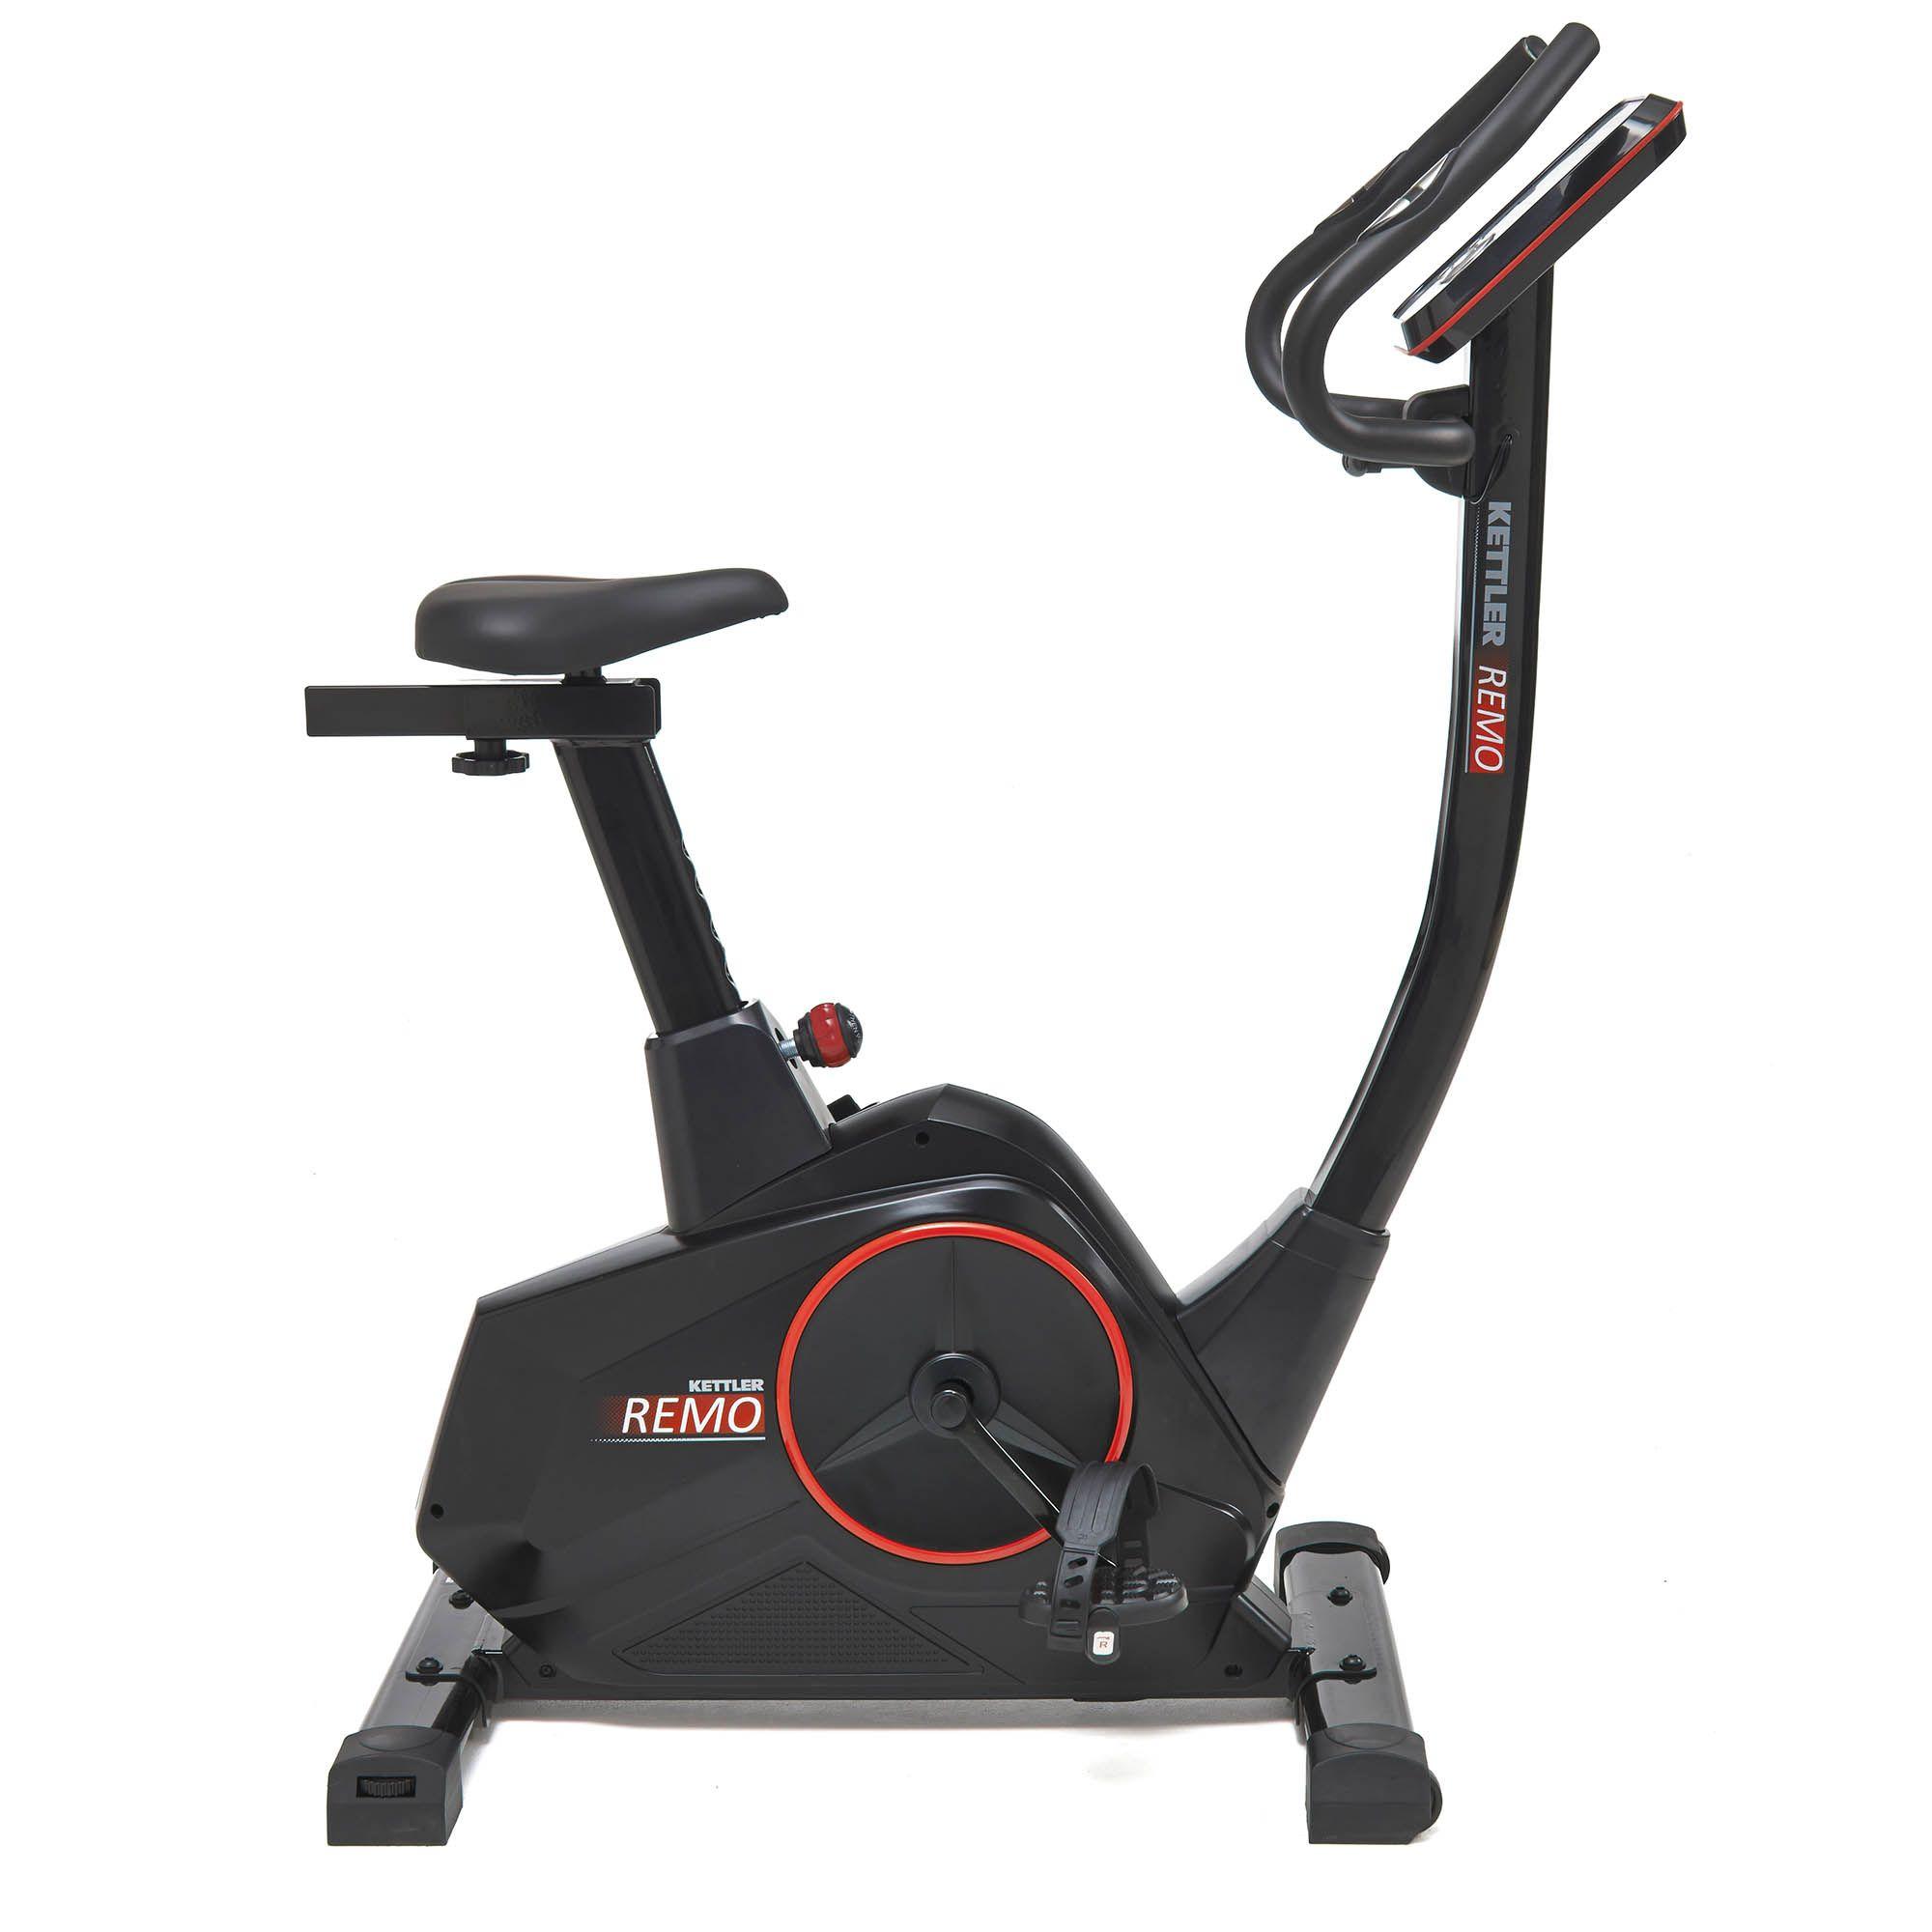 Kettler Remo Exercise Bike - Sweatband.com